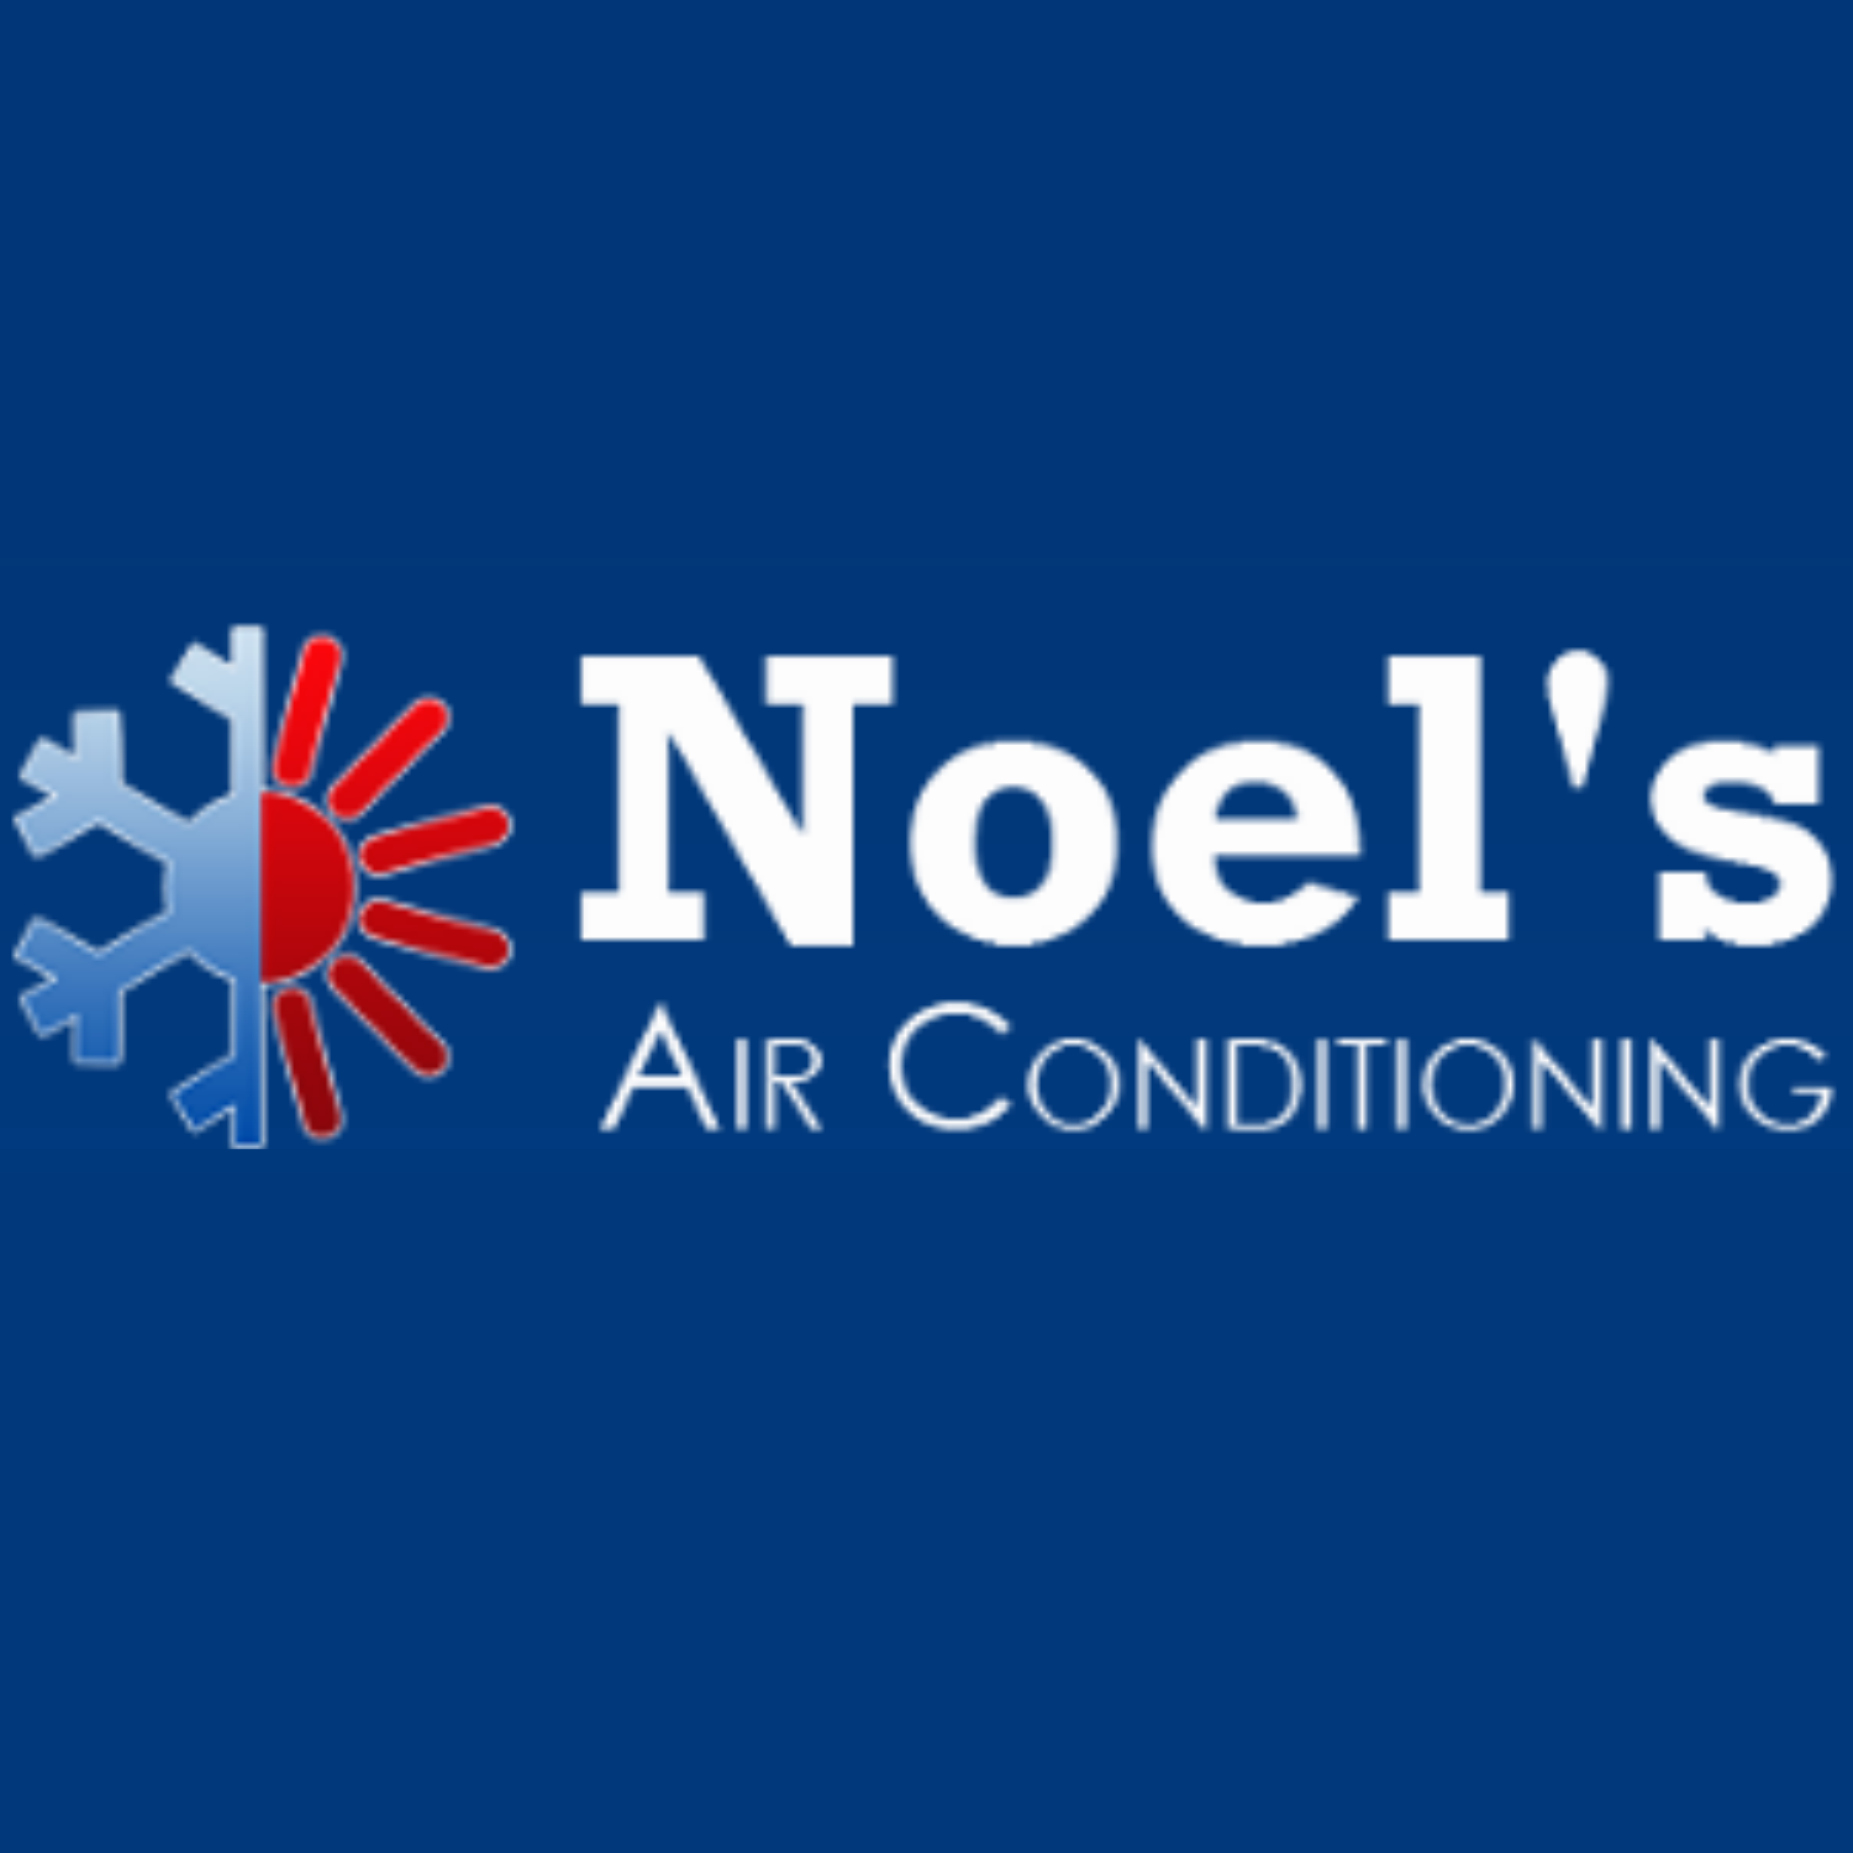 Noel's Air Conditioning